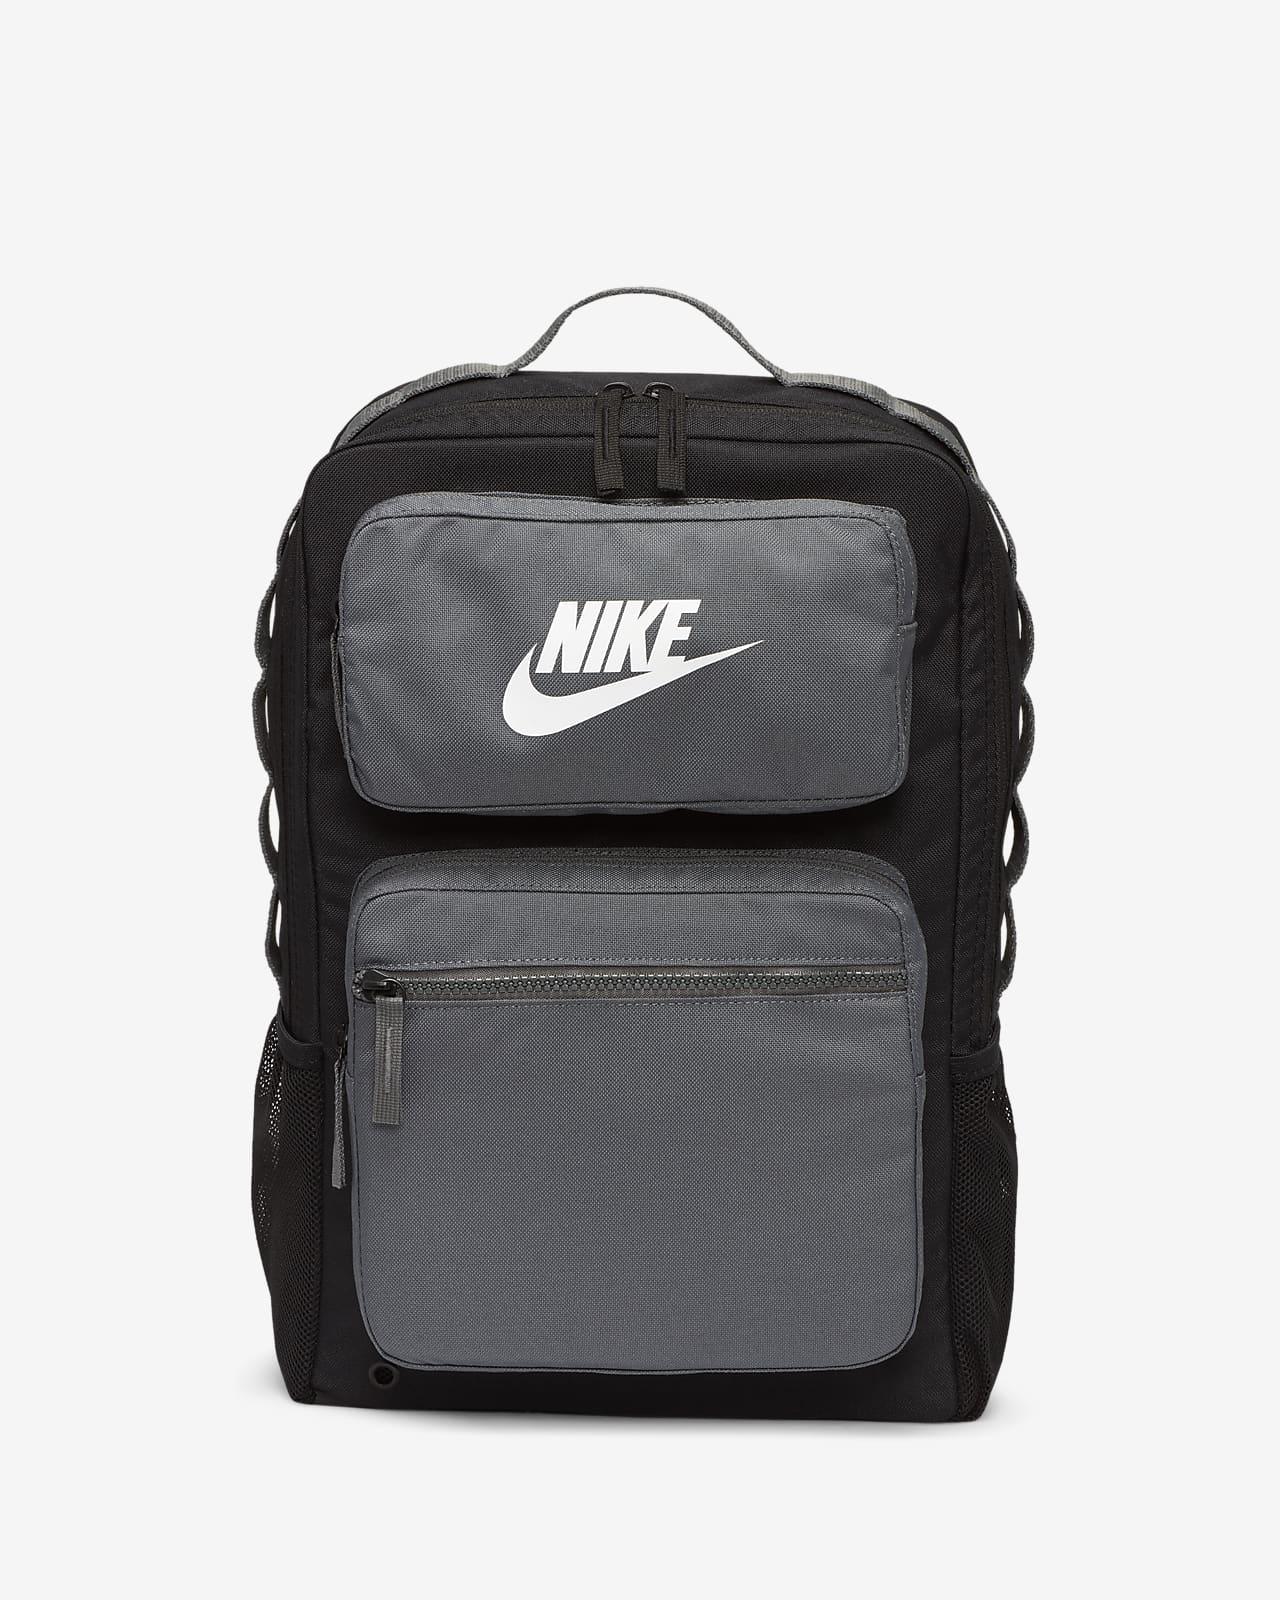 Mochila Nike Future Pro para criança